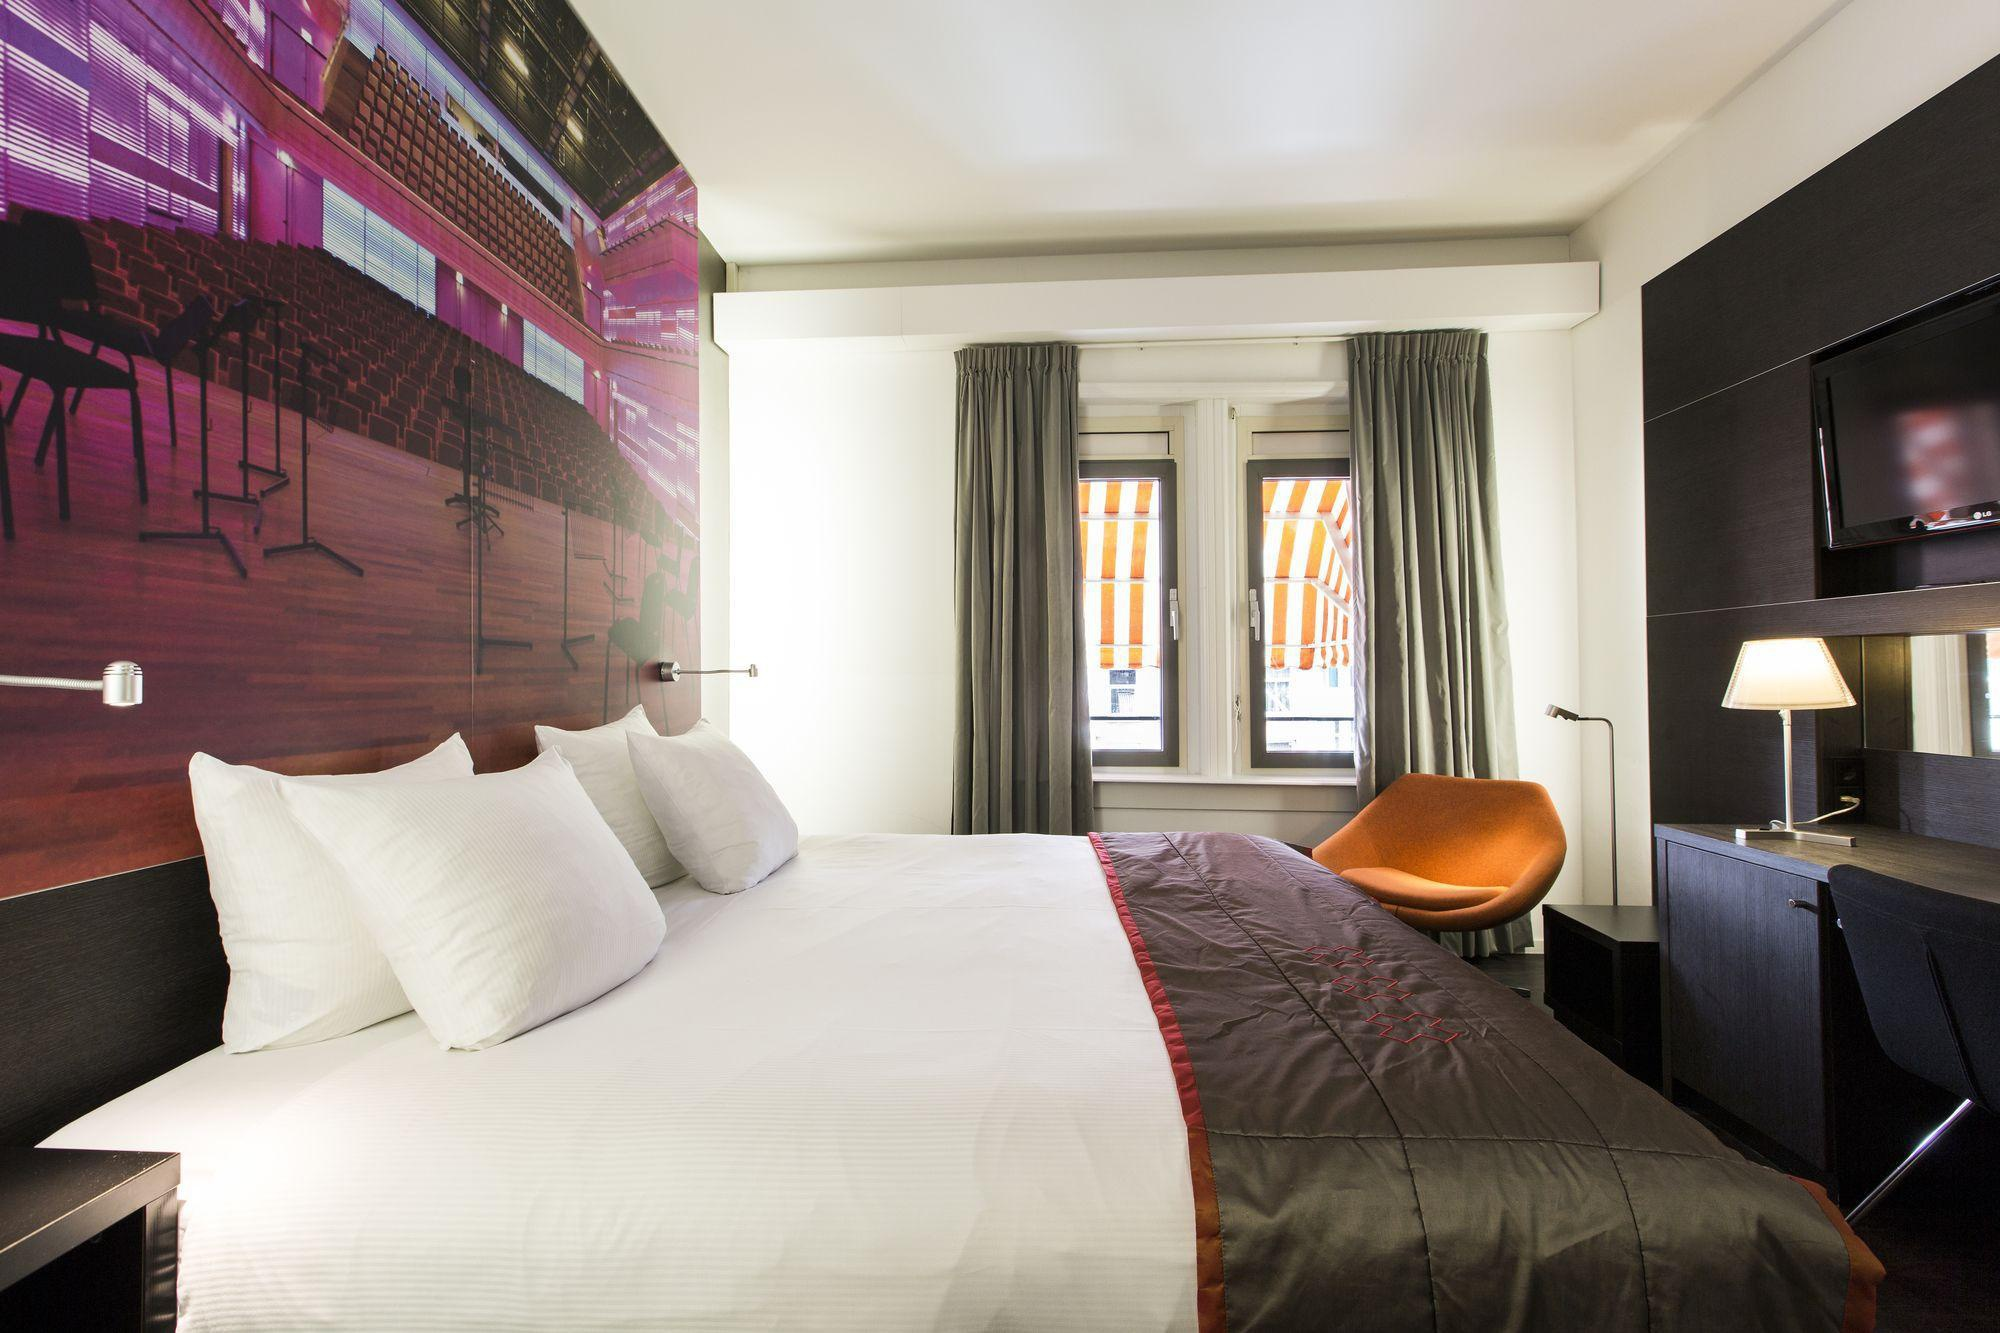 Hotel Amsterdam - Offerte b&b e alberghi da € 194 | Skyscanner